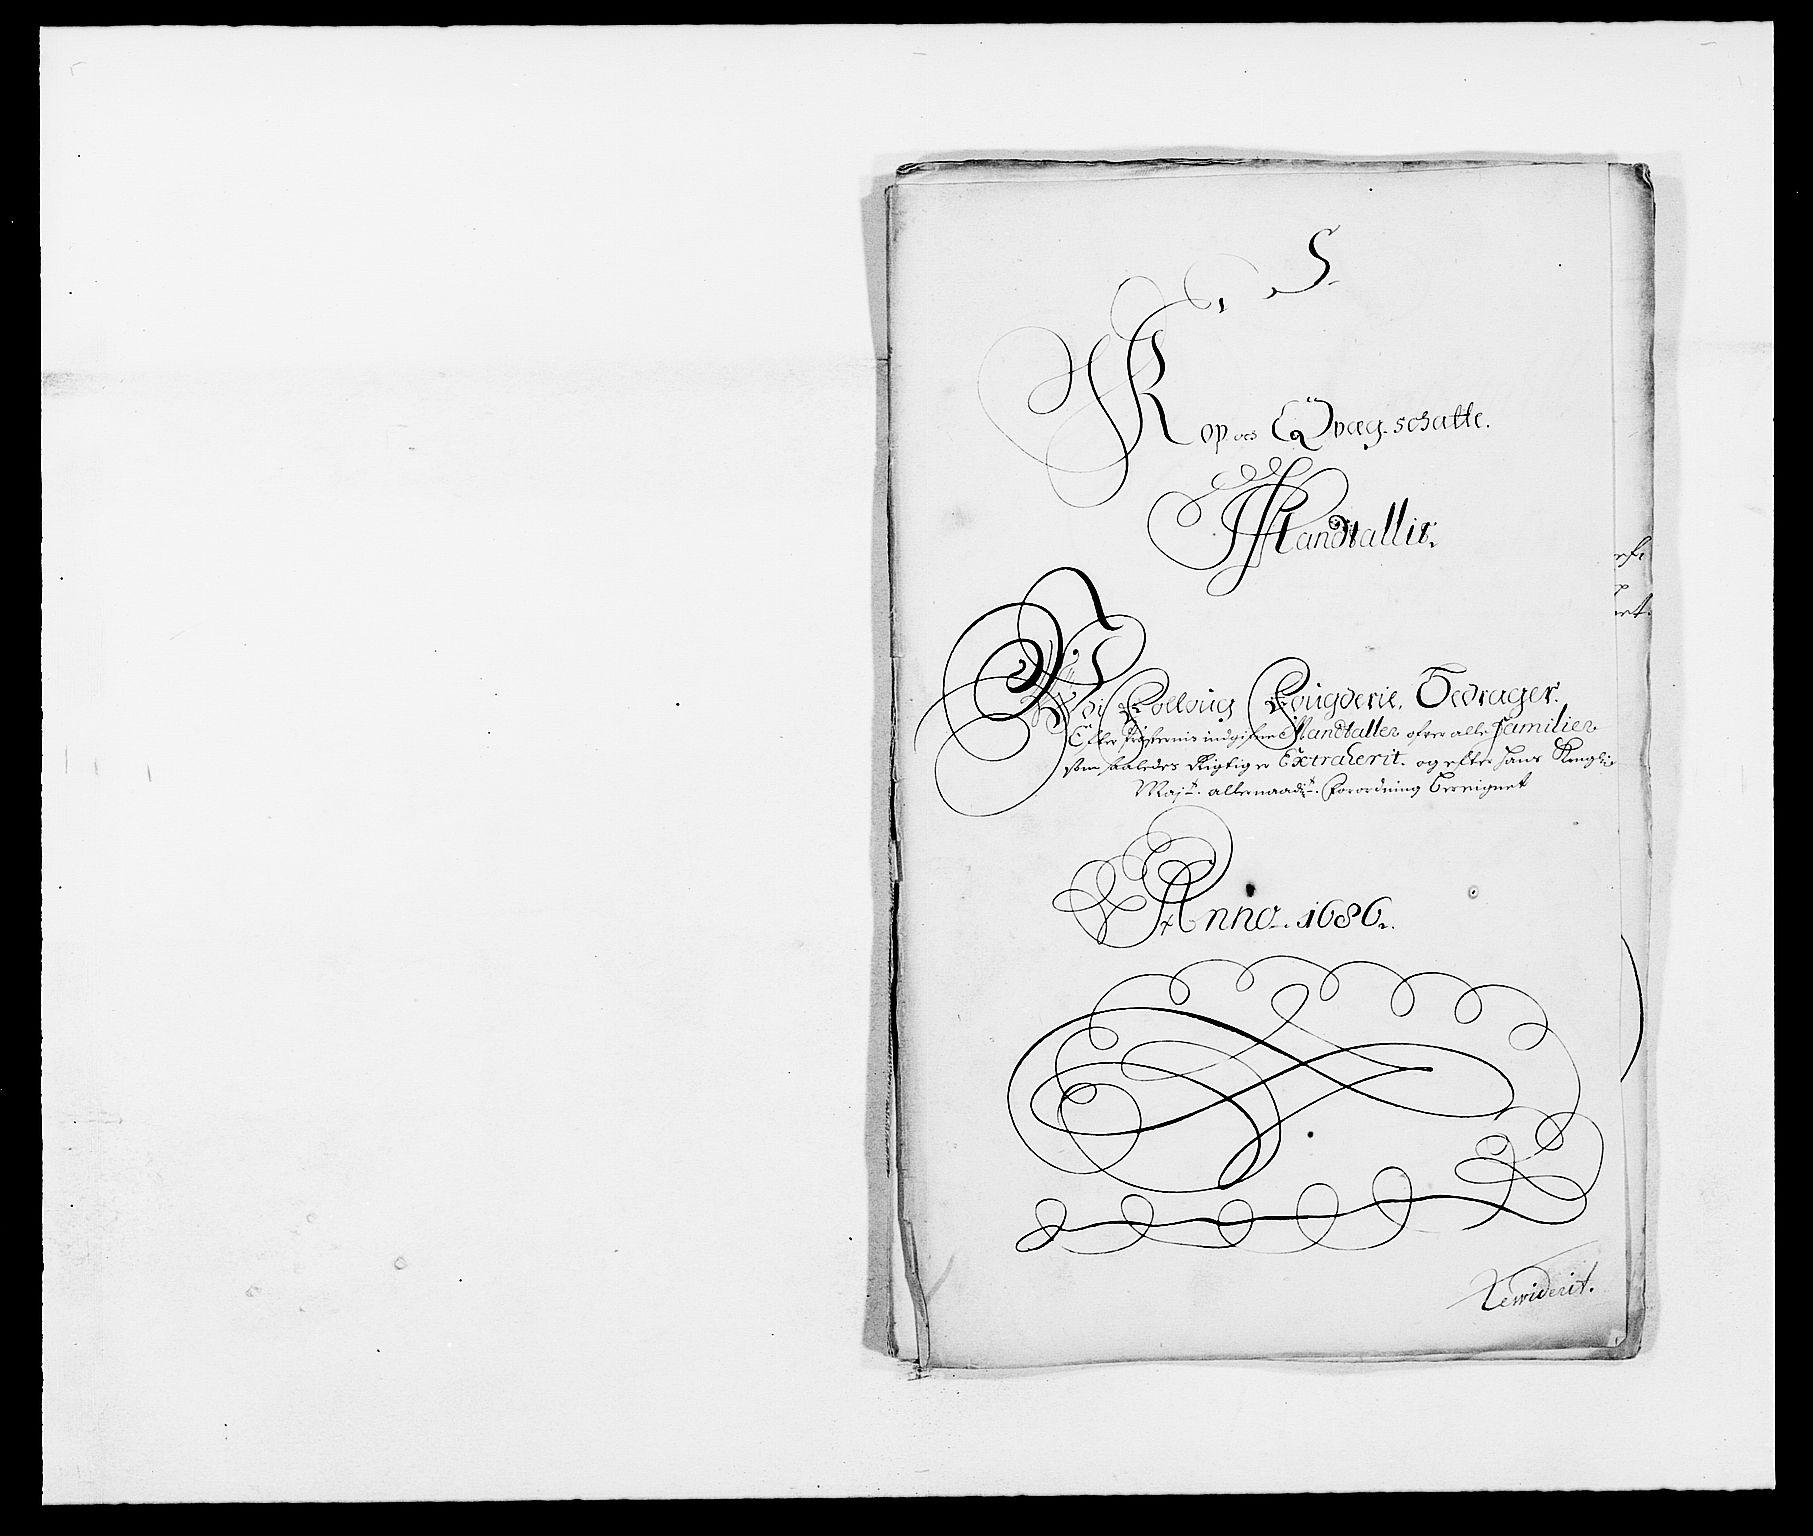 RA, Rentekammeret inntil 1814, Reviderte regnskaper, Fogderegnskap, R09/L0433: Fogderegnskap Follo, 1685-1686, s. 443